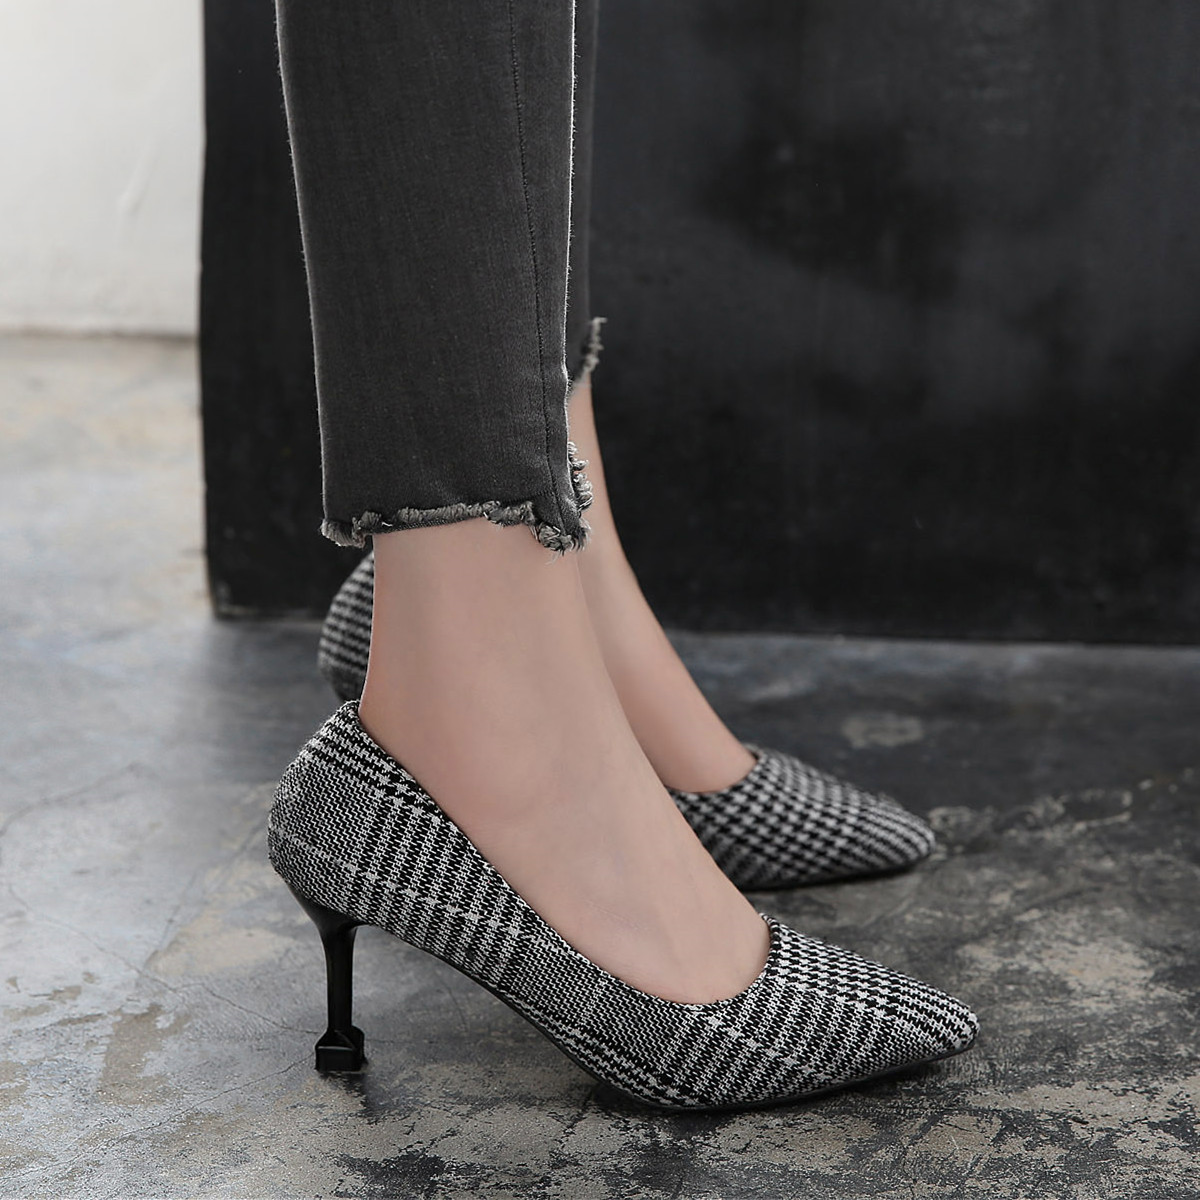 Office Shoes Women New Arrival 2019 Women Pumps Evening Shoes Sexy High Heels Luxury Shoes Women Designers Fetish High Heels